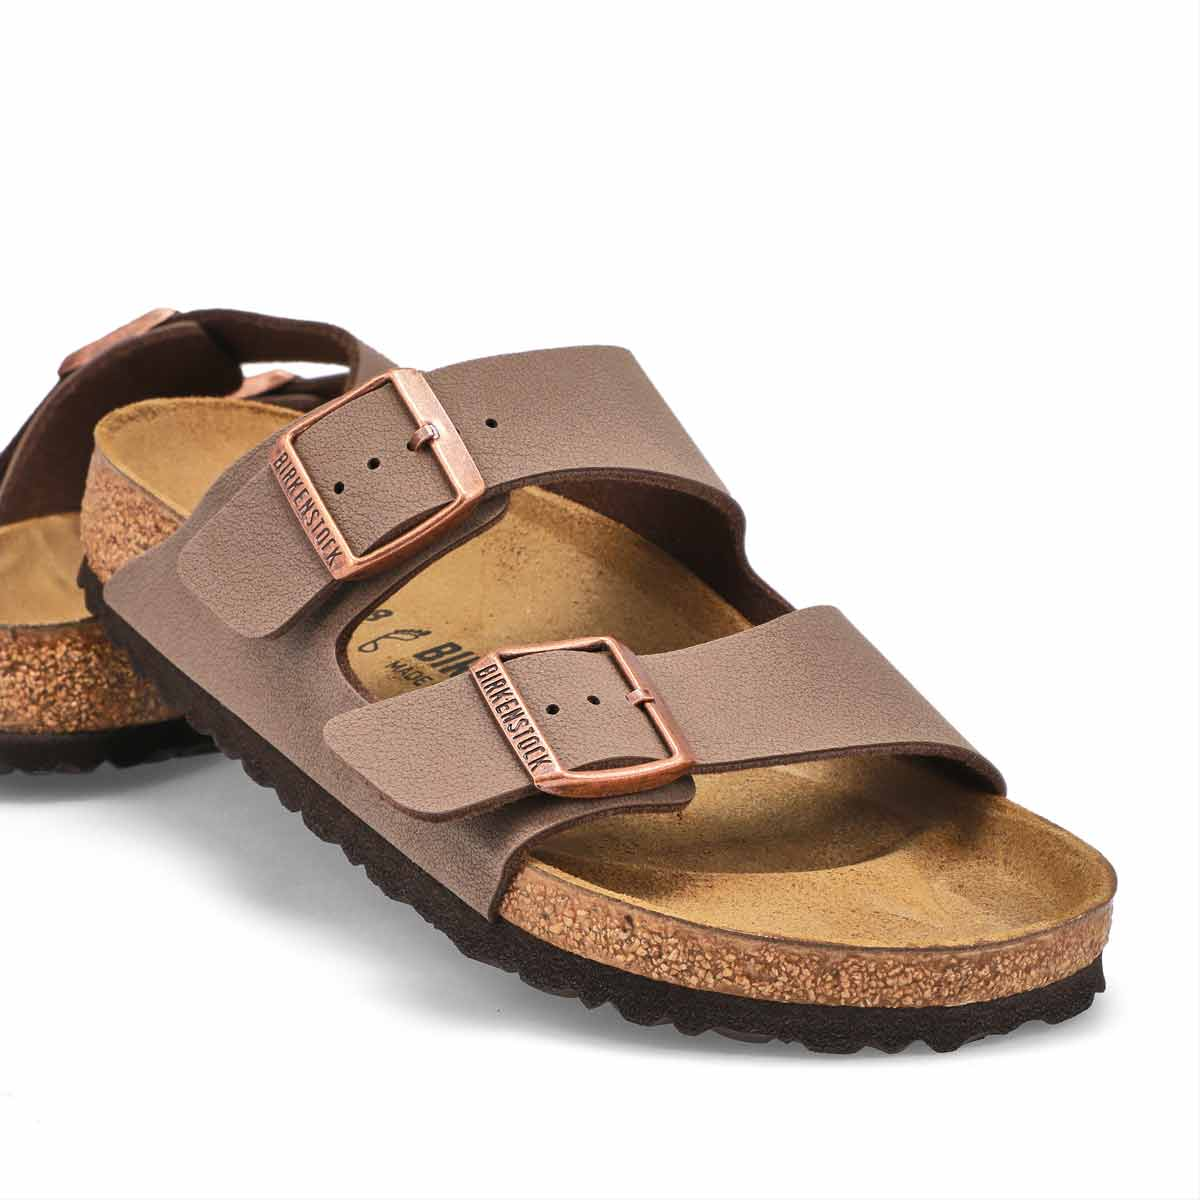 Sandales 2brides ARIZONABF, moka, femmes